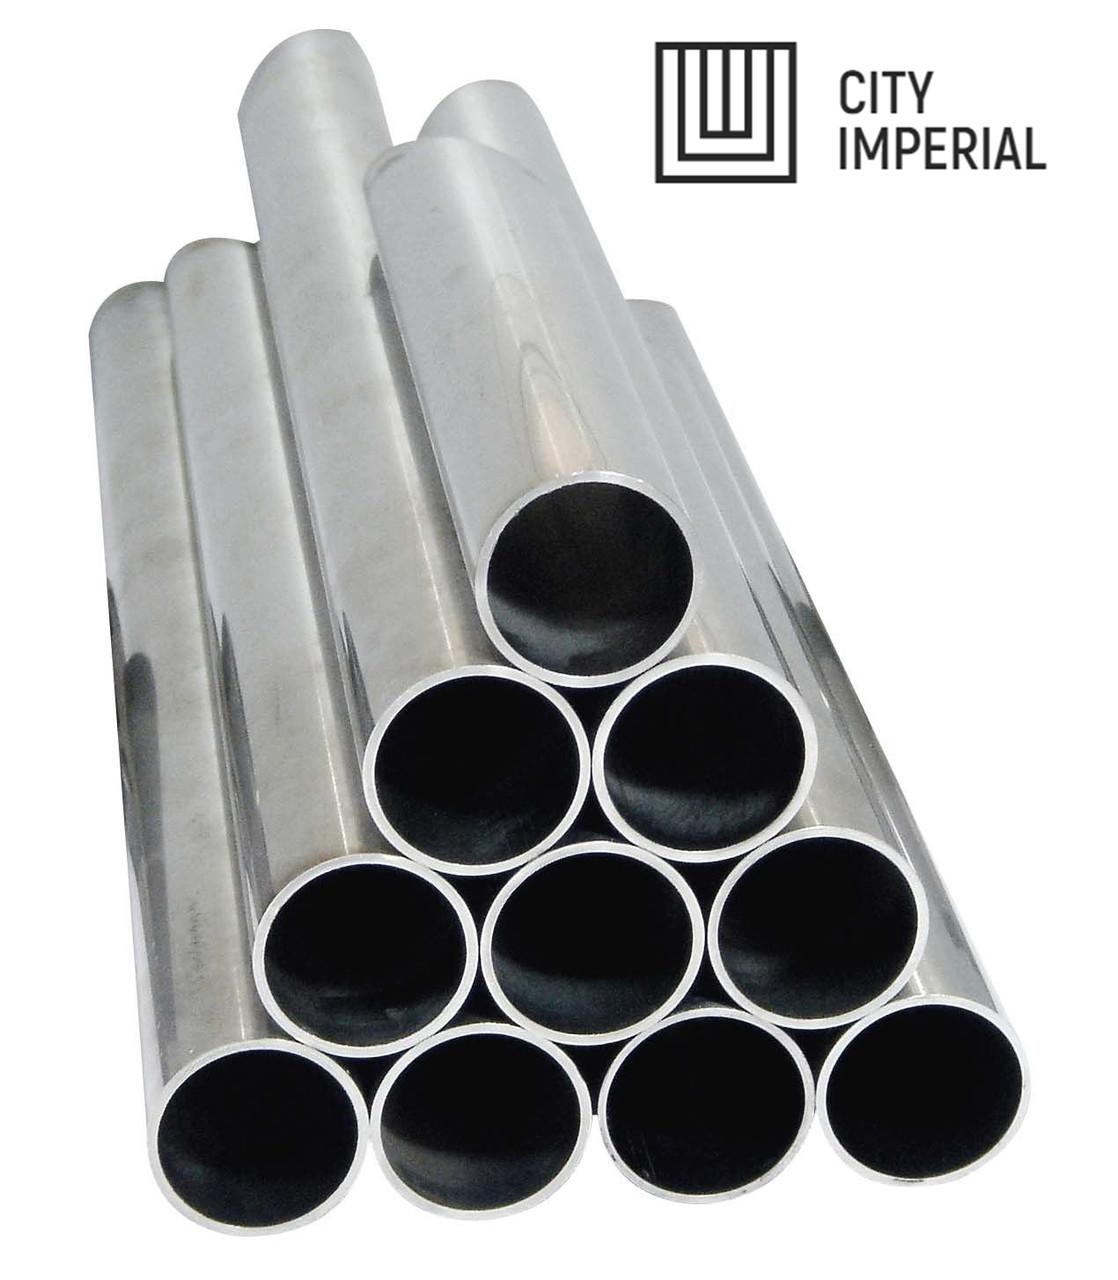 Труба 108 х 4,5 сталь 20